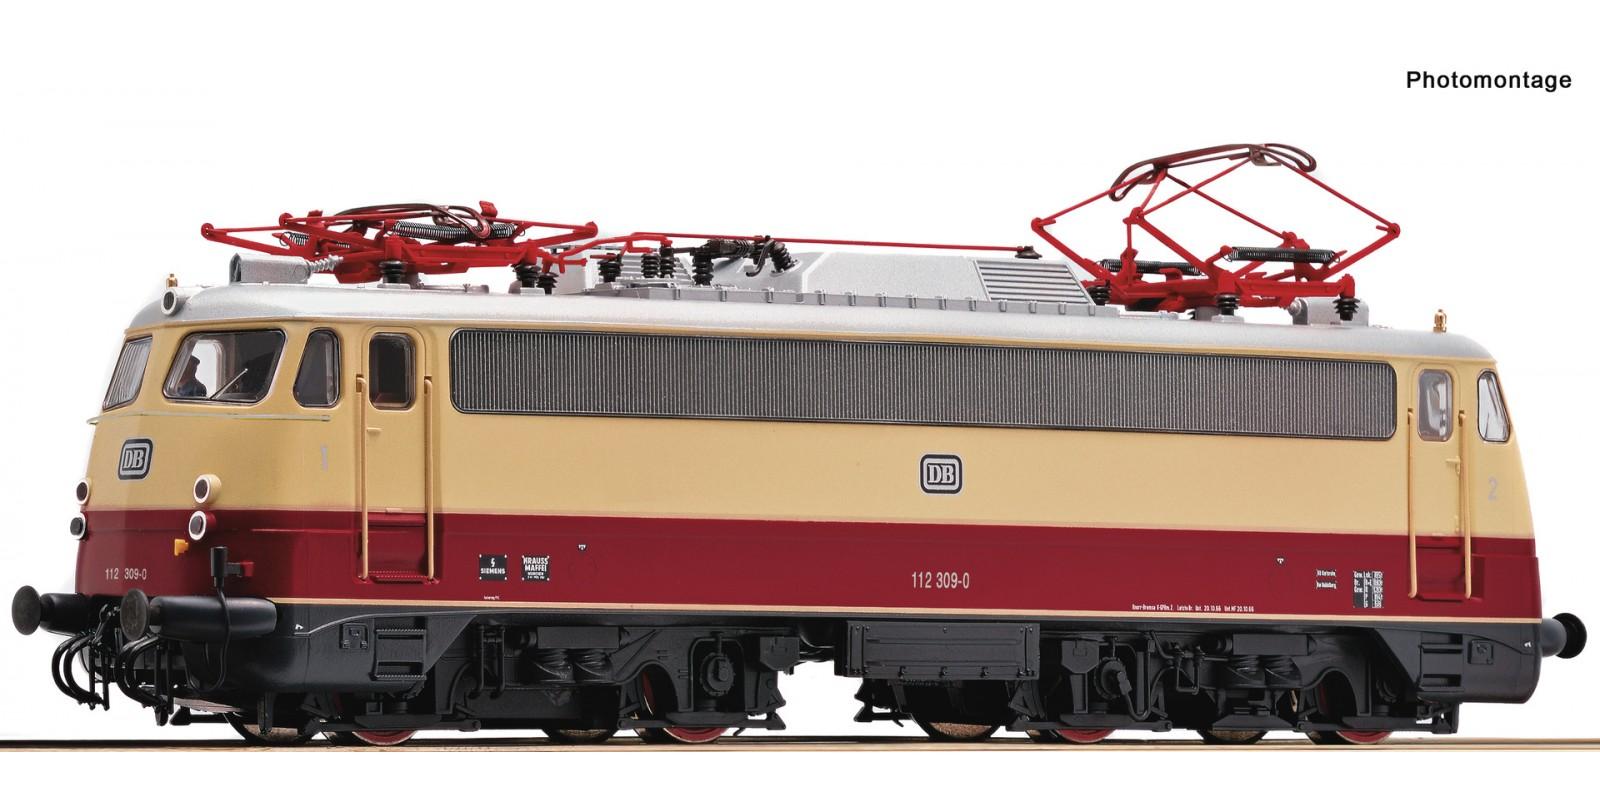 RO73077 - Electric locomotive 112 309-0, DB